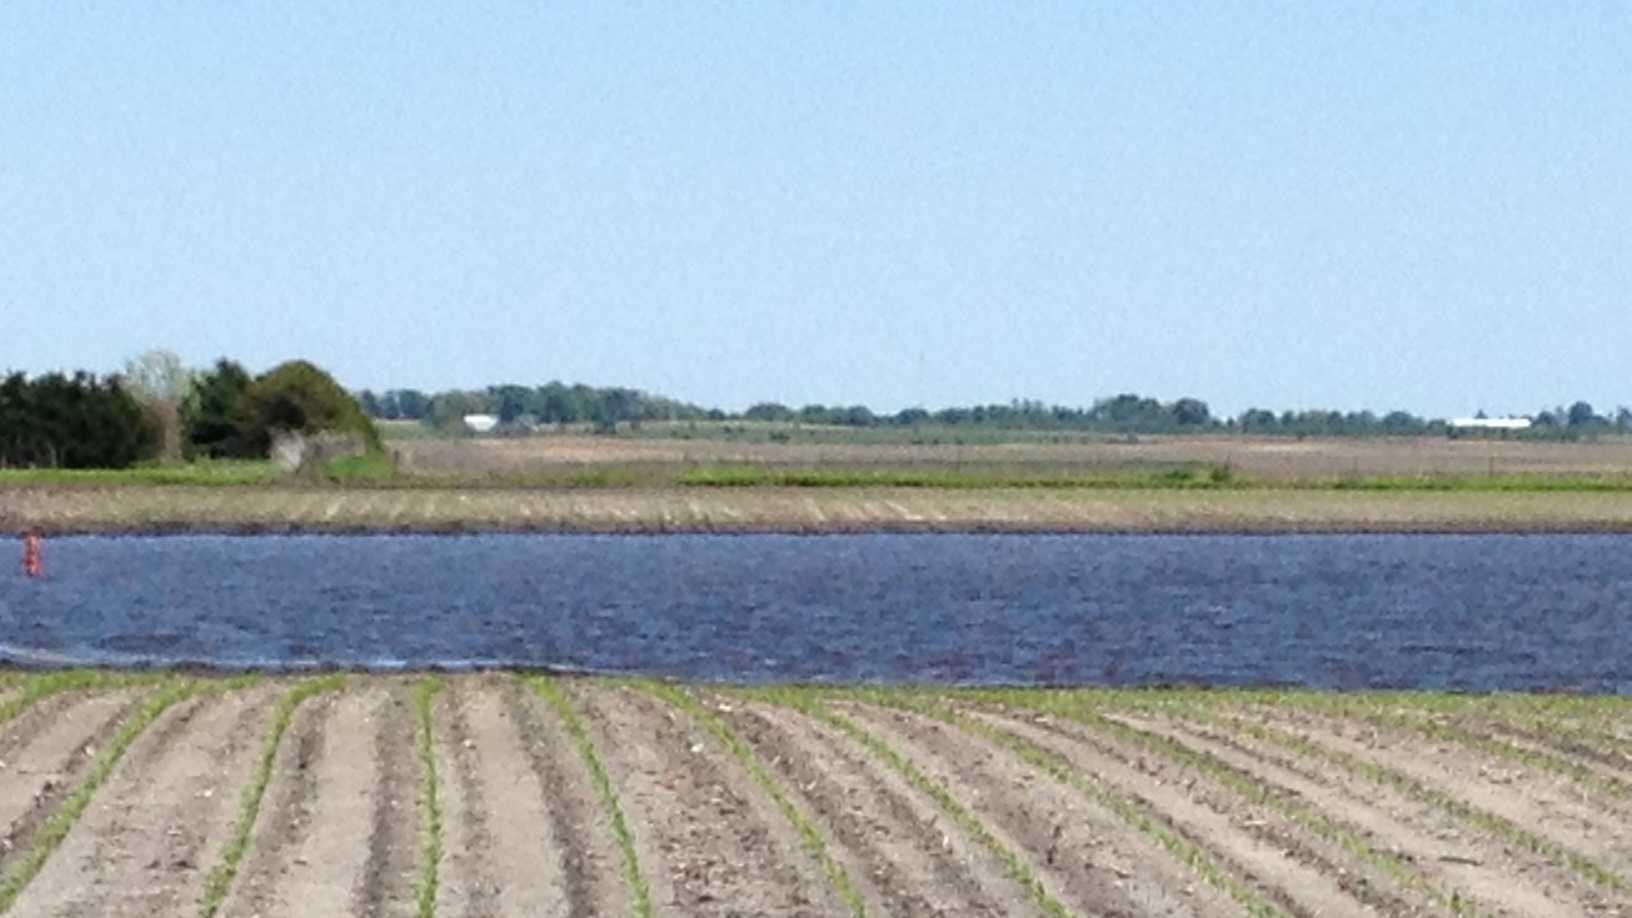 Flooded farm field generic